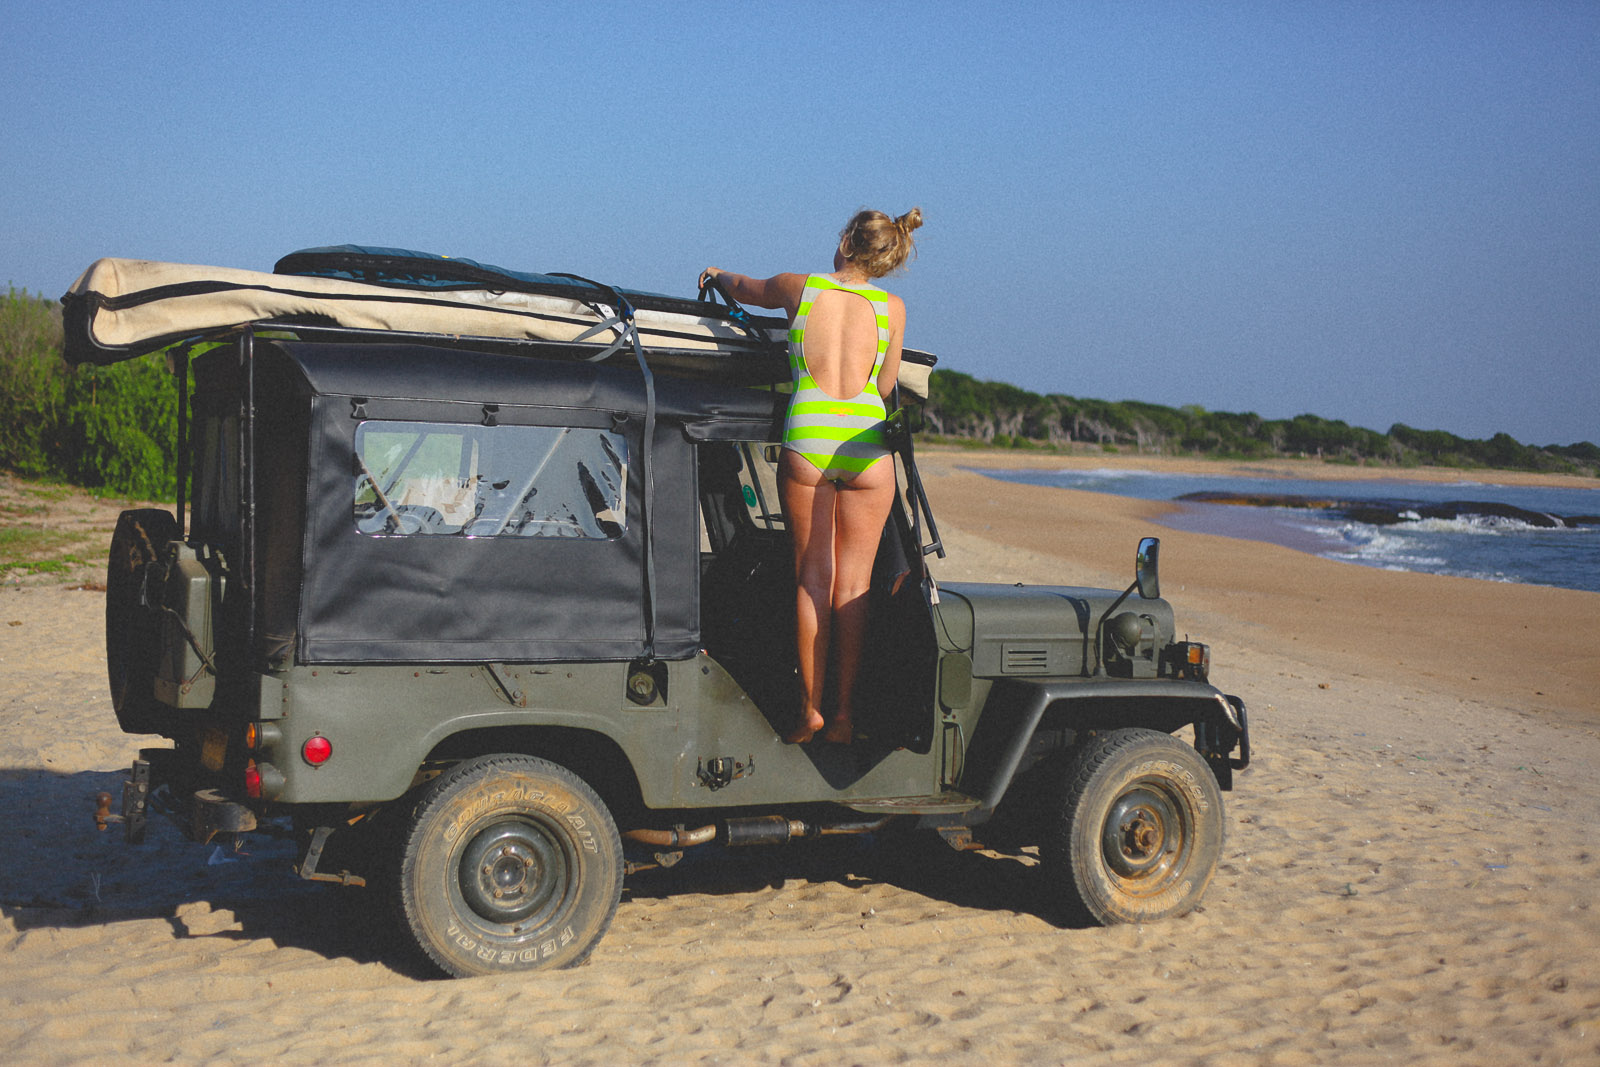 Sunshinestories-surf-travel-blog-IMG_3239